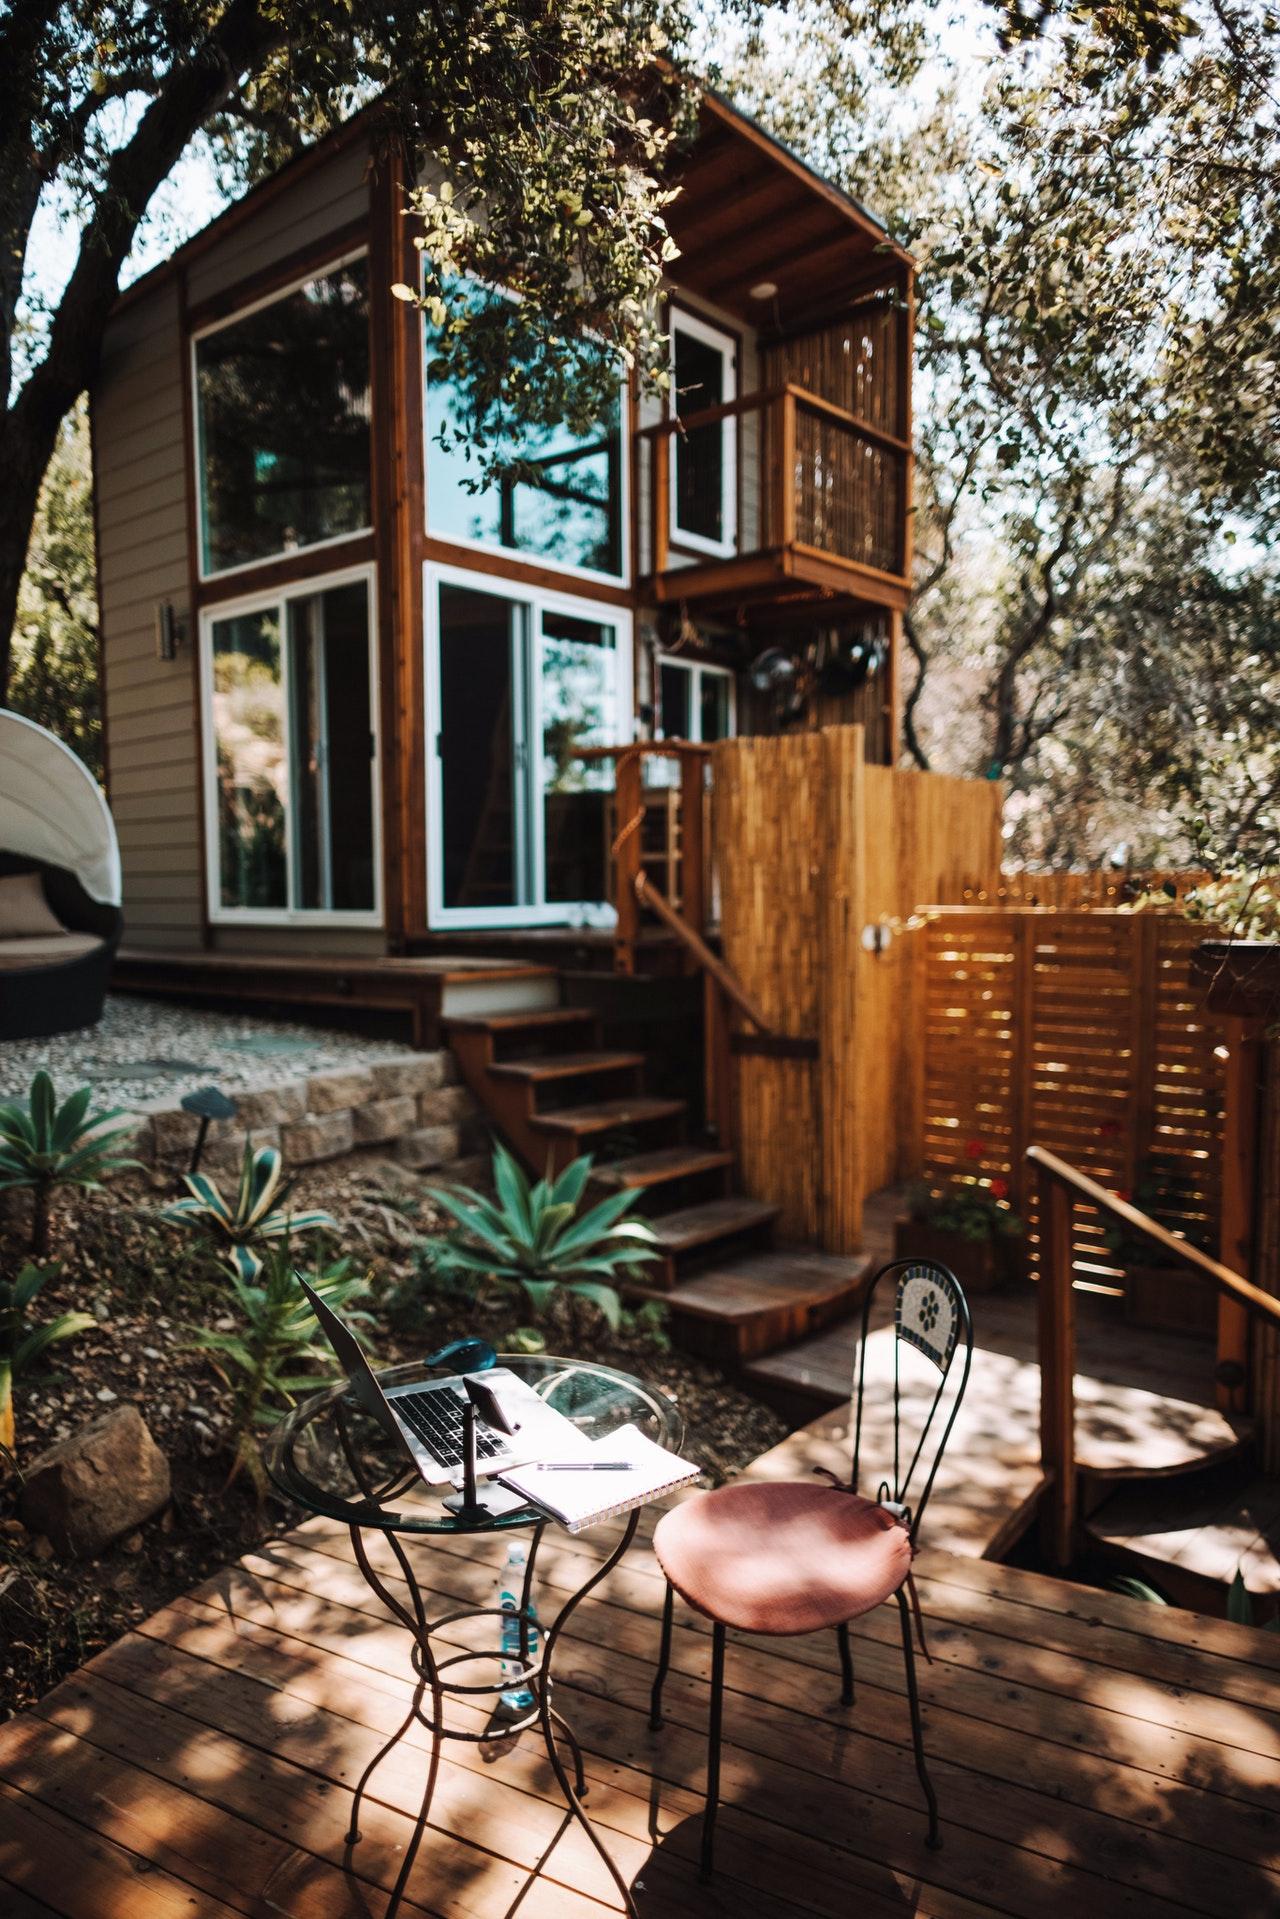 in-law suite homes for sale around locust grove, virginia